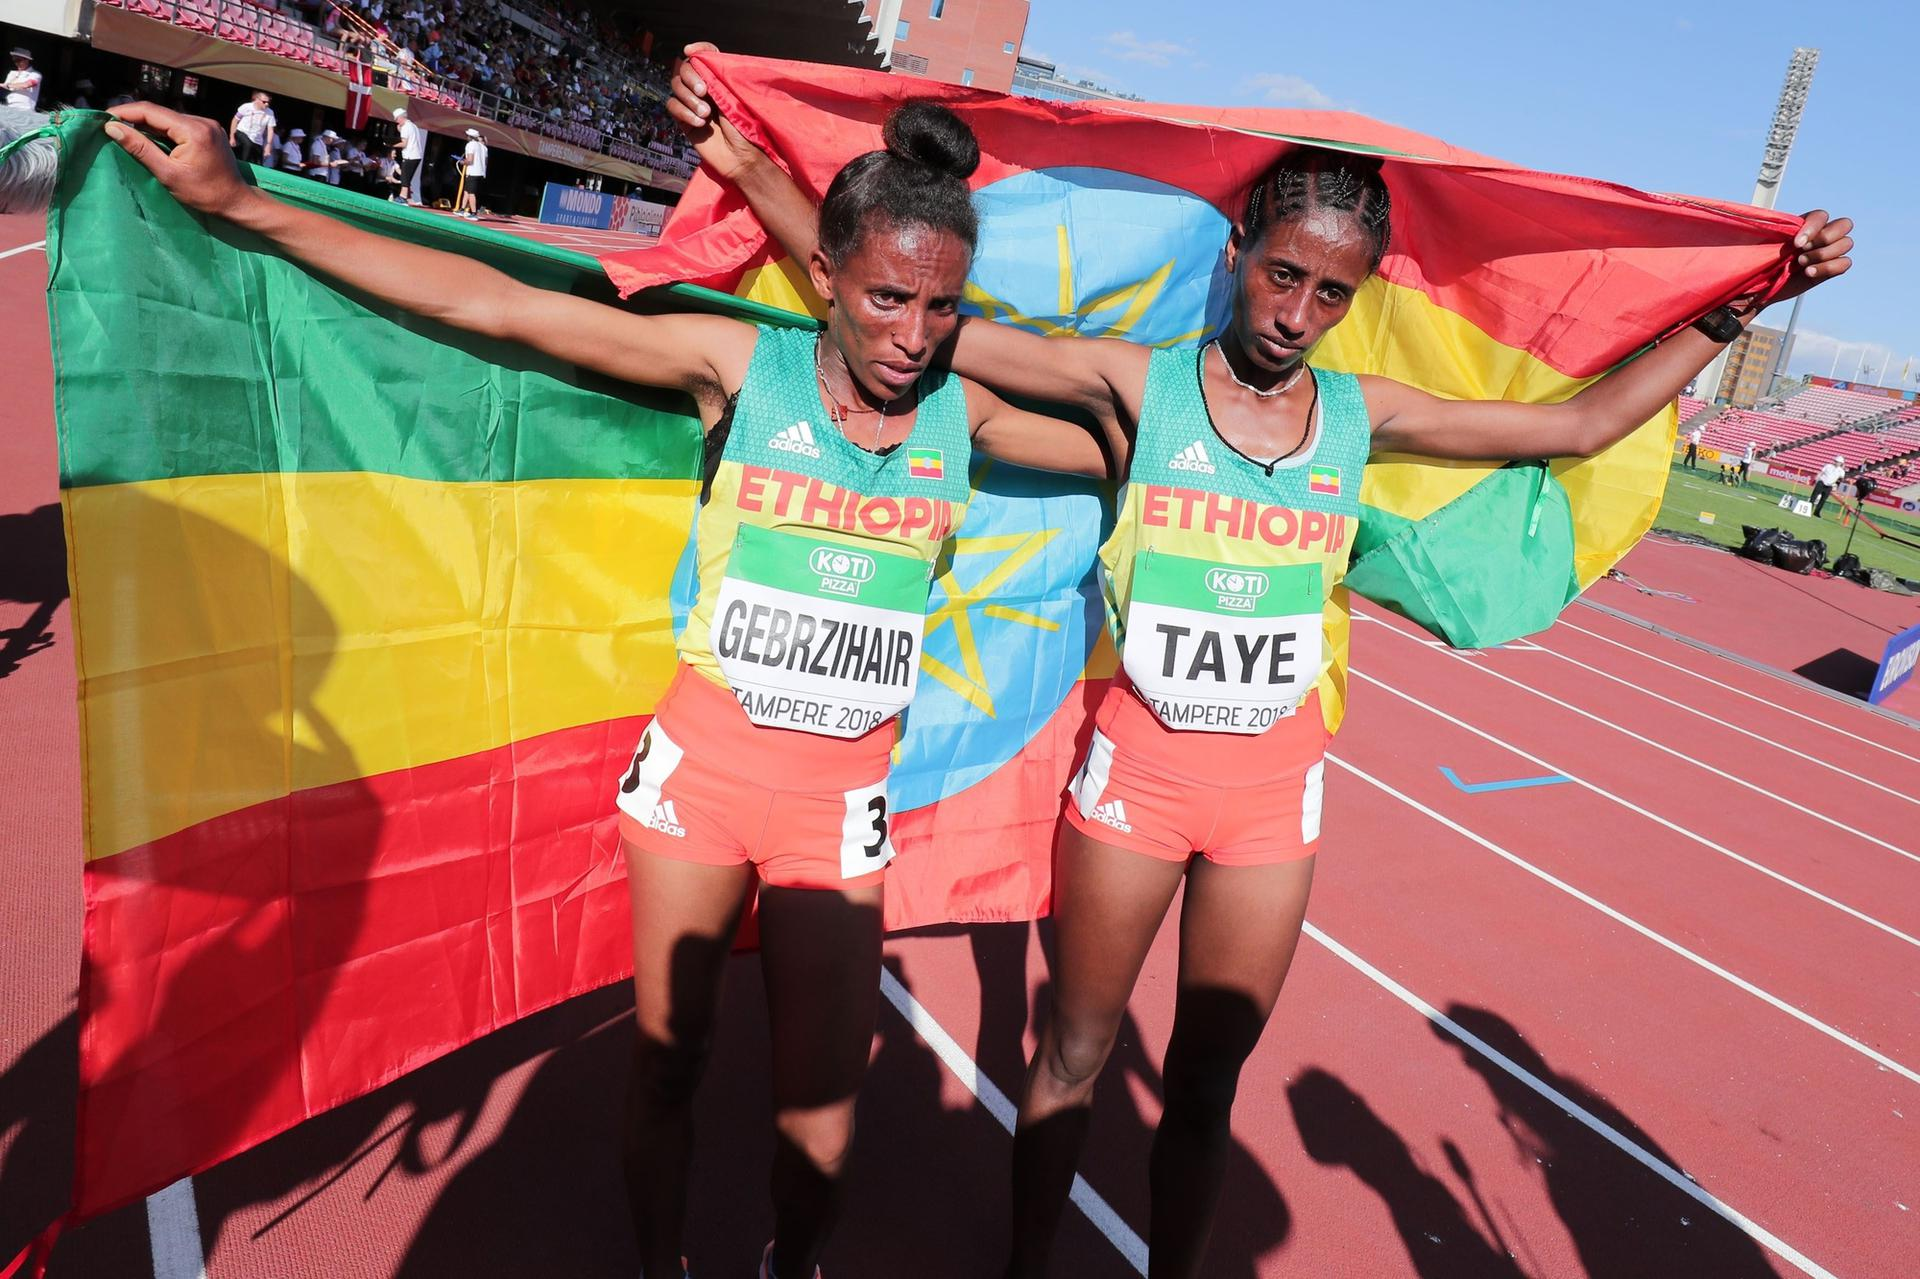 Randki etiopskie